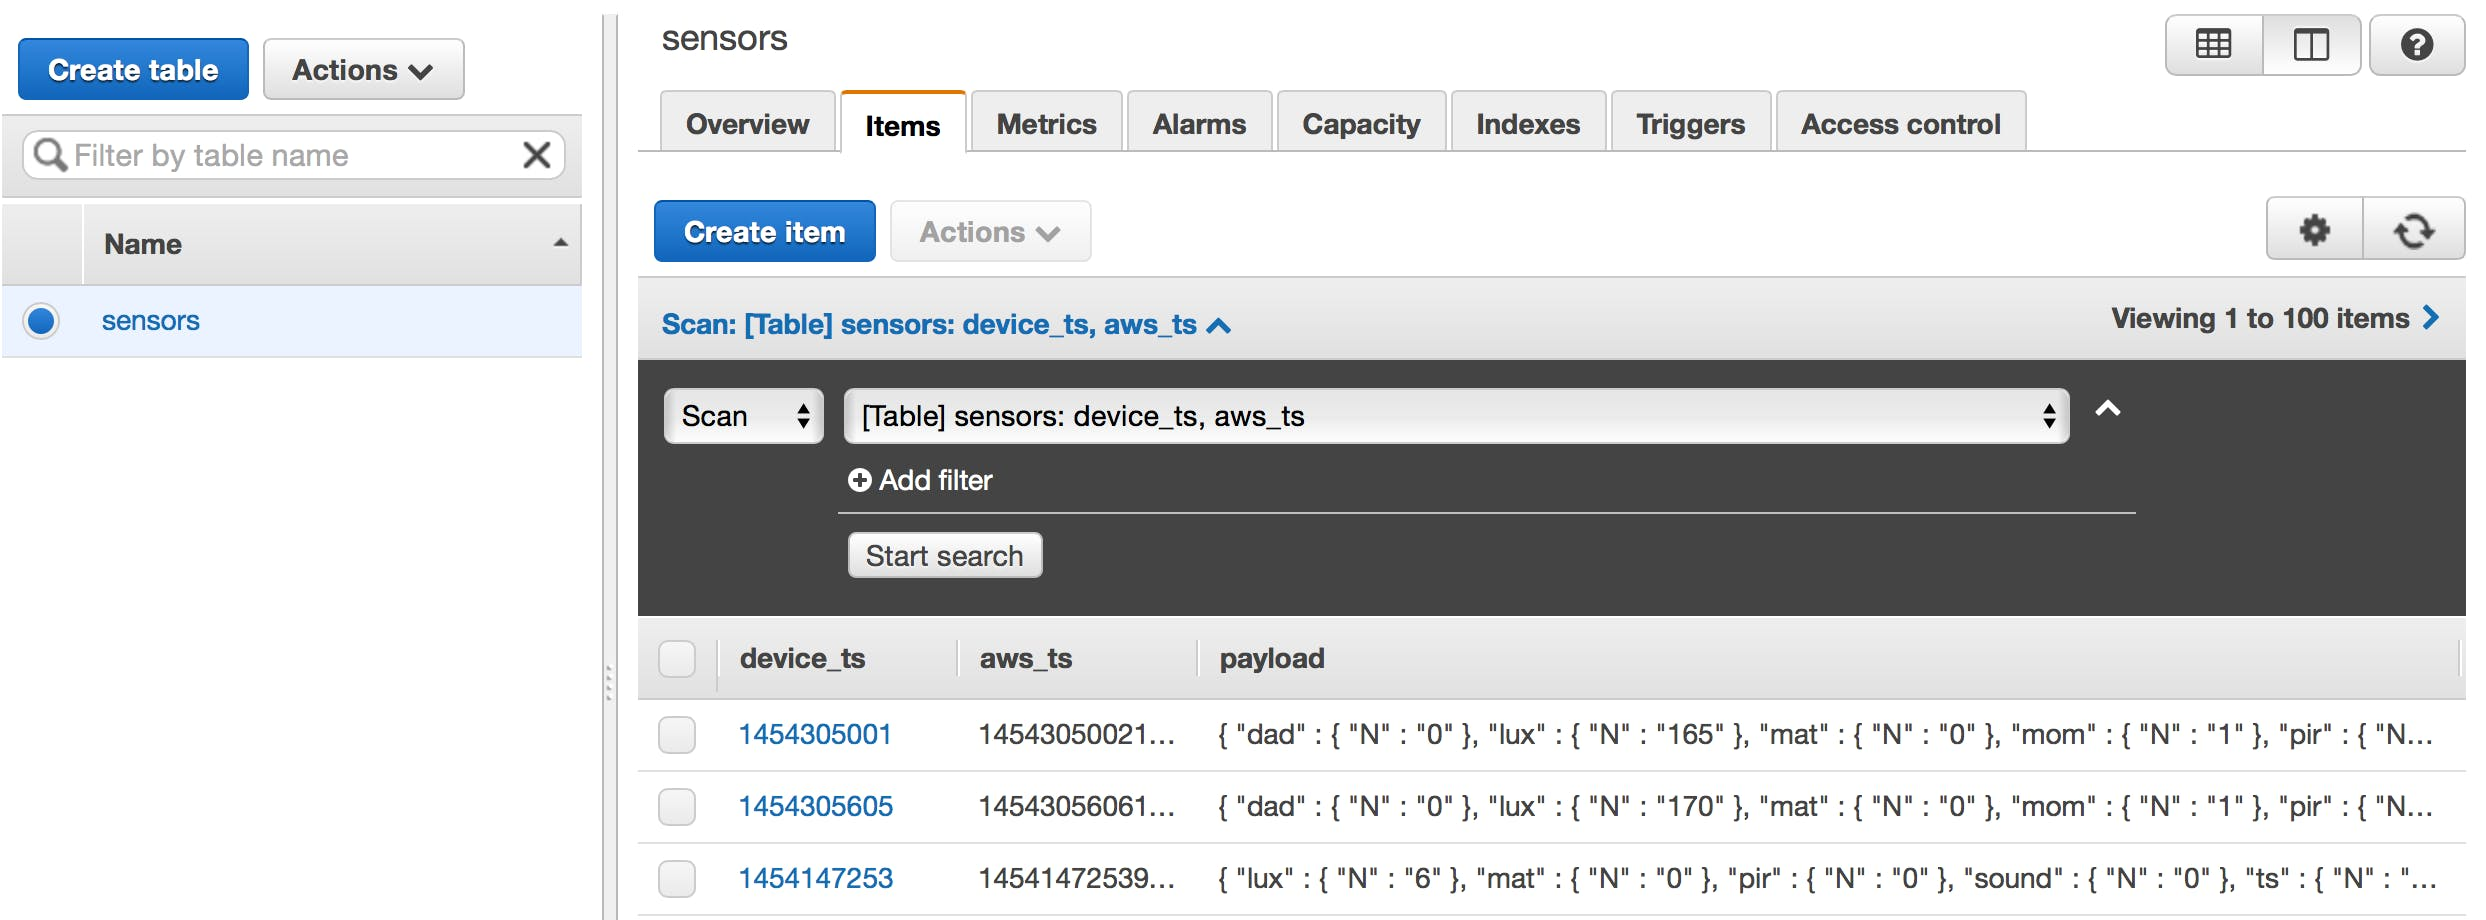 Sensor data in a DynamoDB database